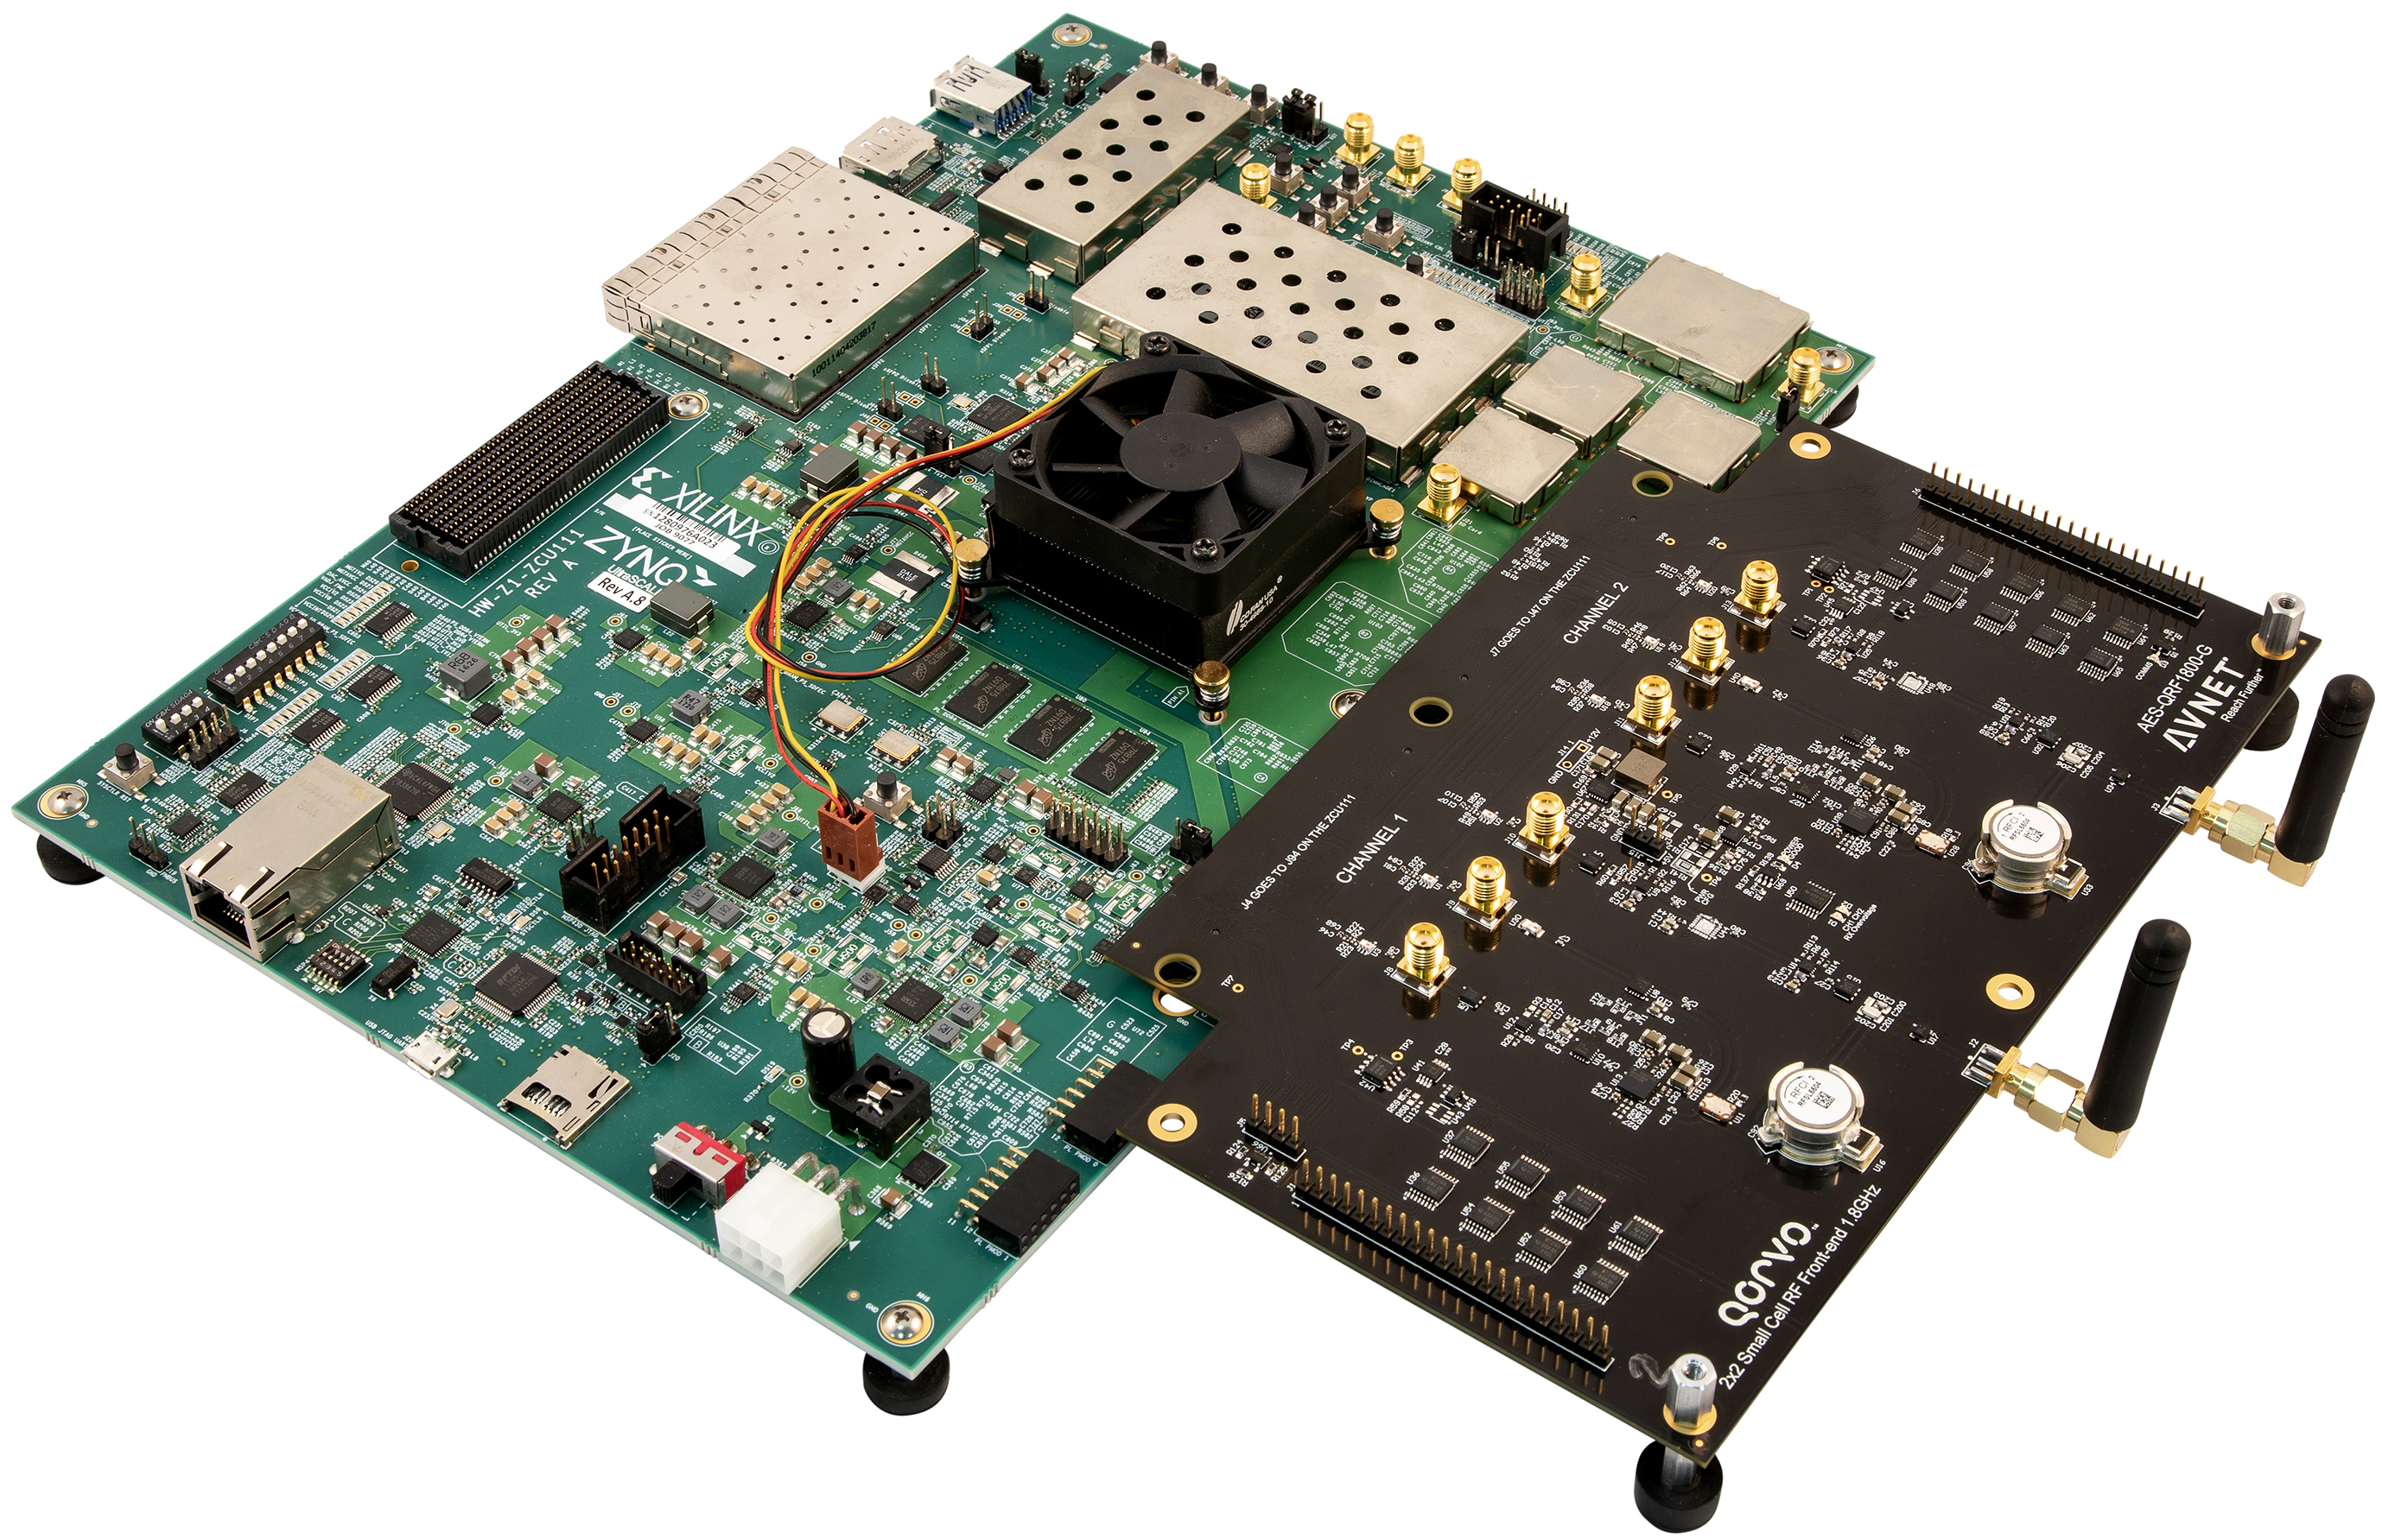 Avnet Accelerates Wireless Design with New RFSoC Development